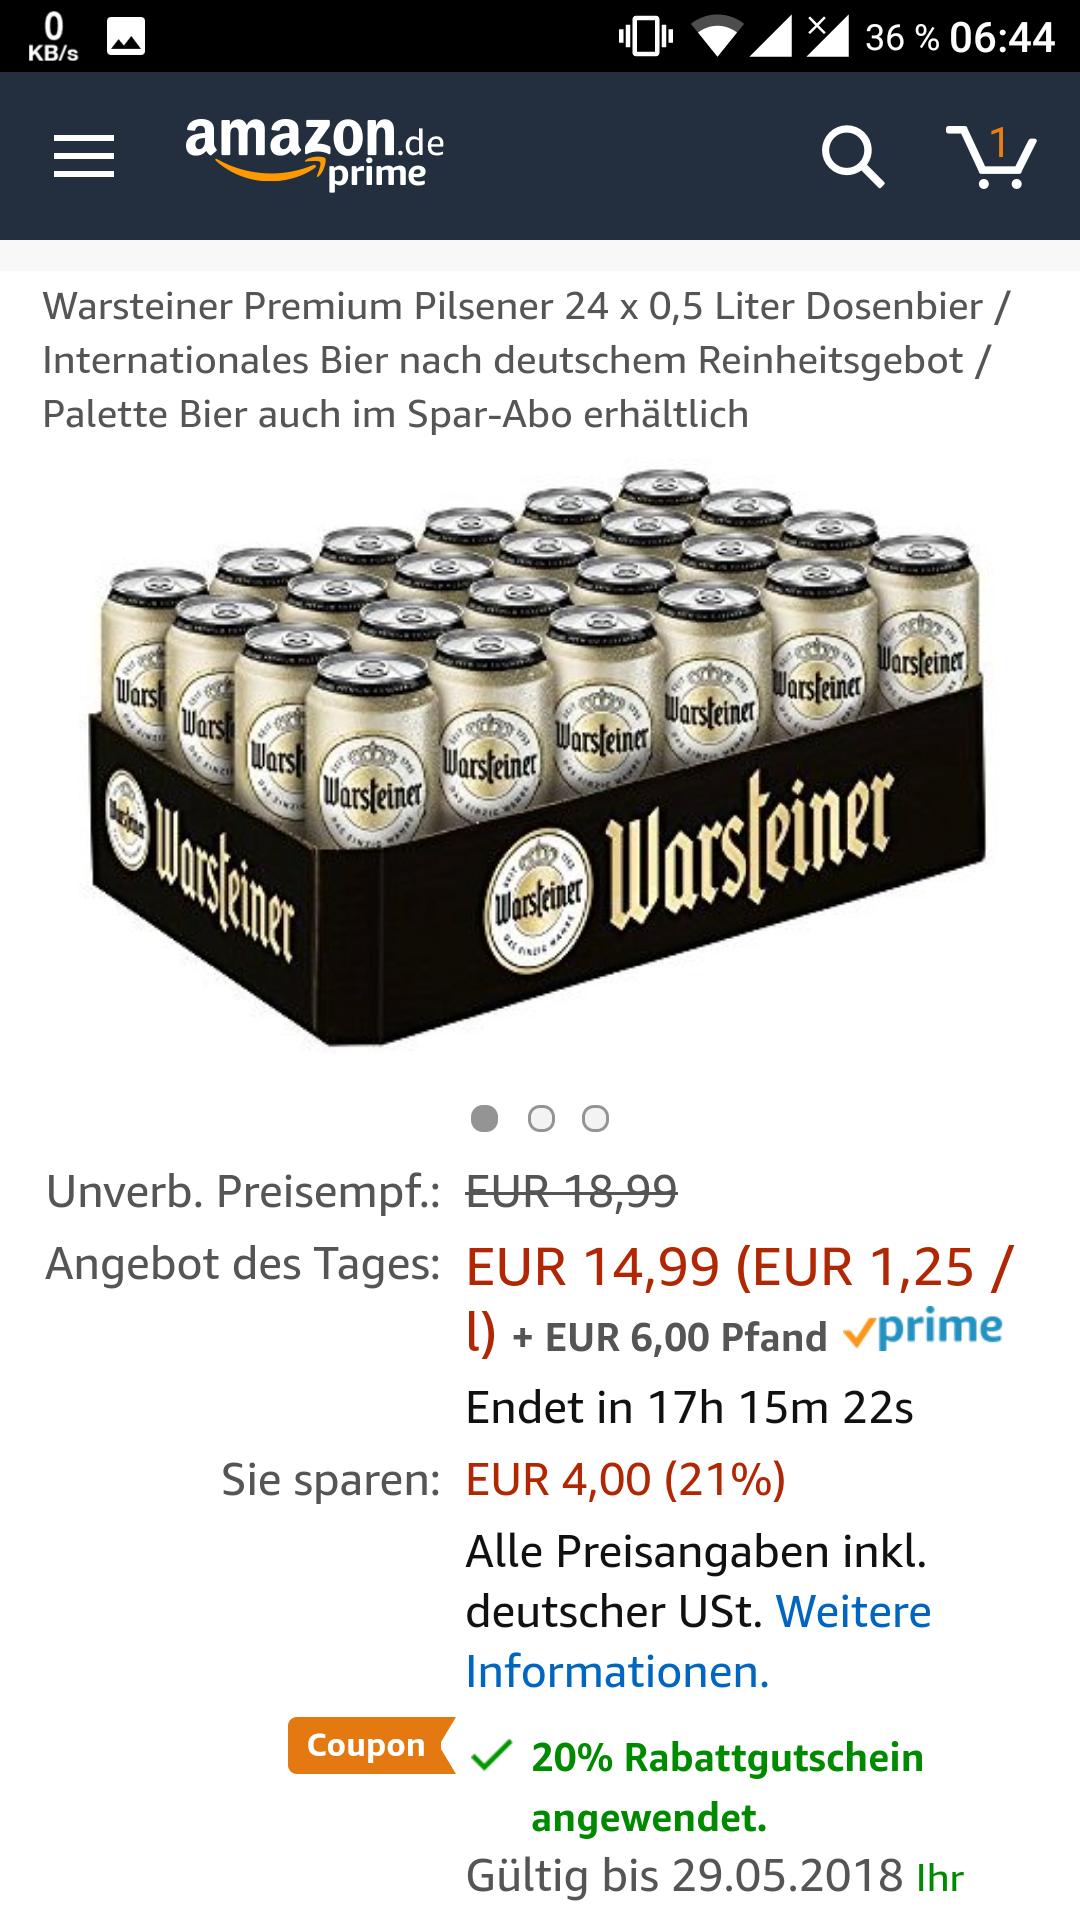 [Prime] Warsteiner Pilsener 24 x 0,5 Liter Dosenbier (eff. 0,49€/Dose)